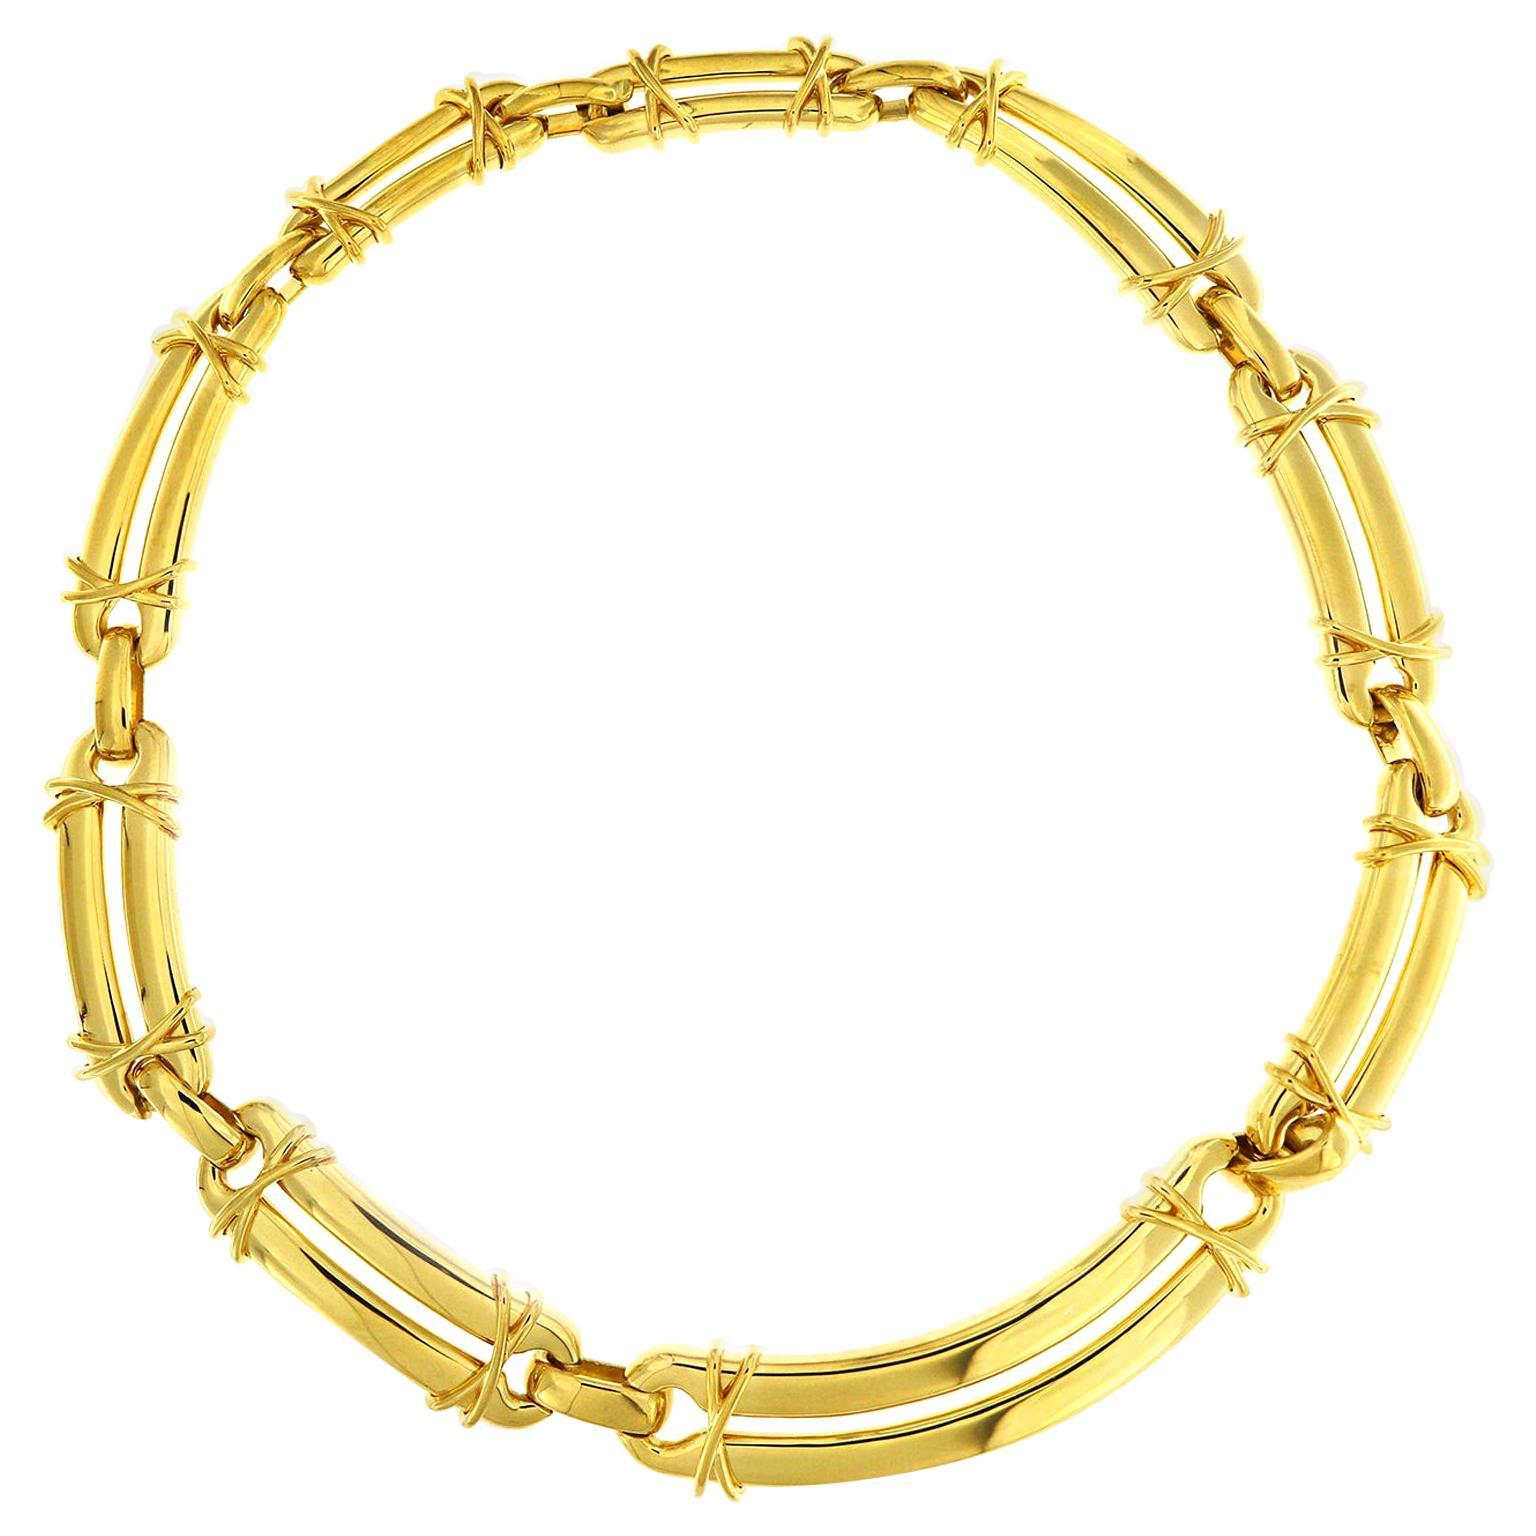 Valentin Magro 18 Karat Yellow Gold Link Choker Necklace